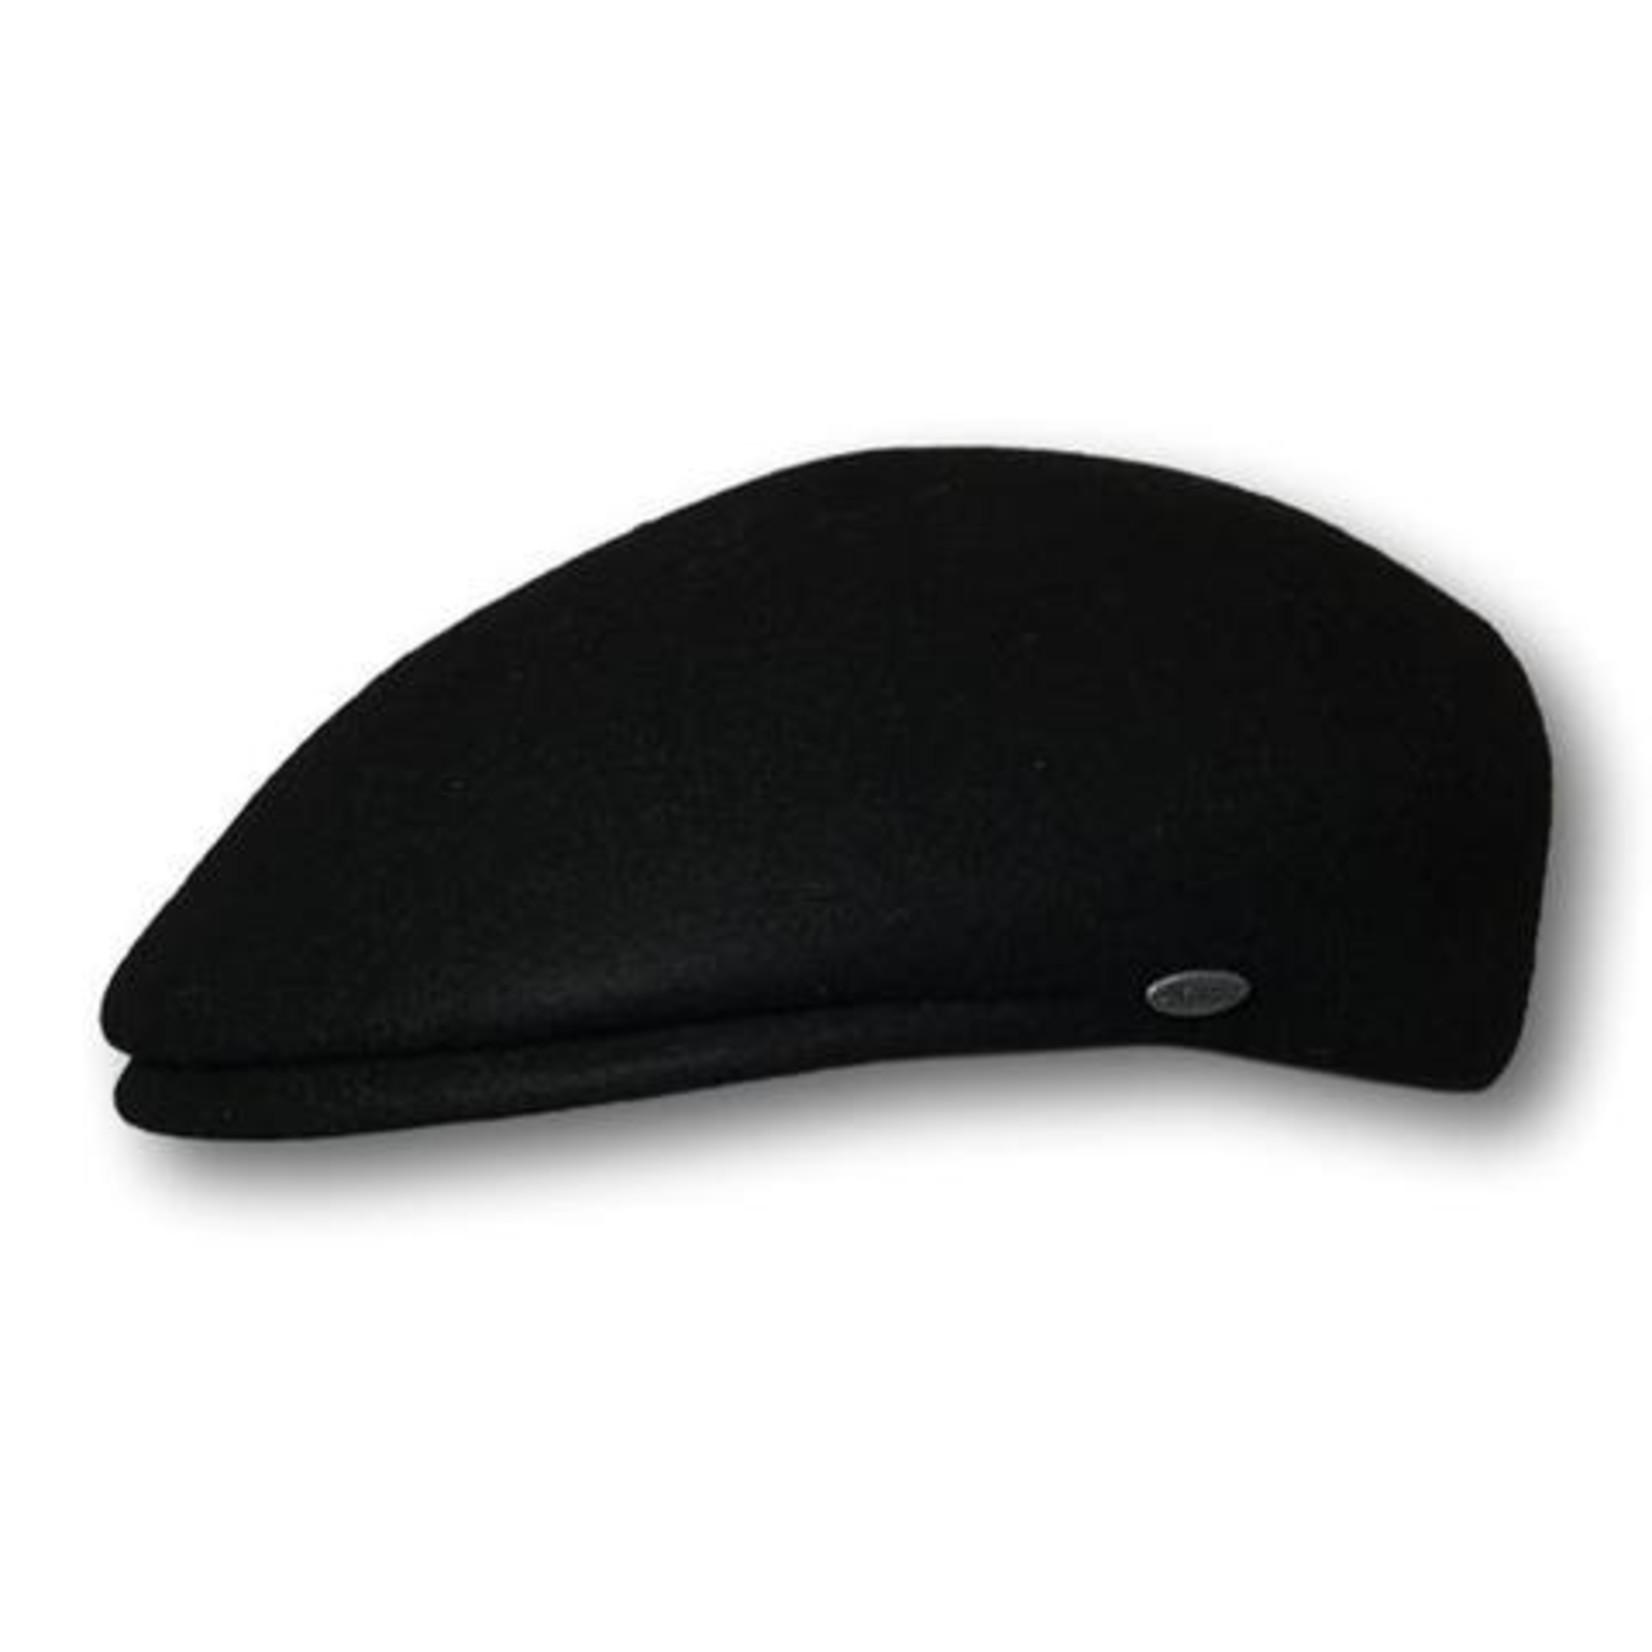 Göttmann Göttmann Monza Hard Shell Cap - Black